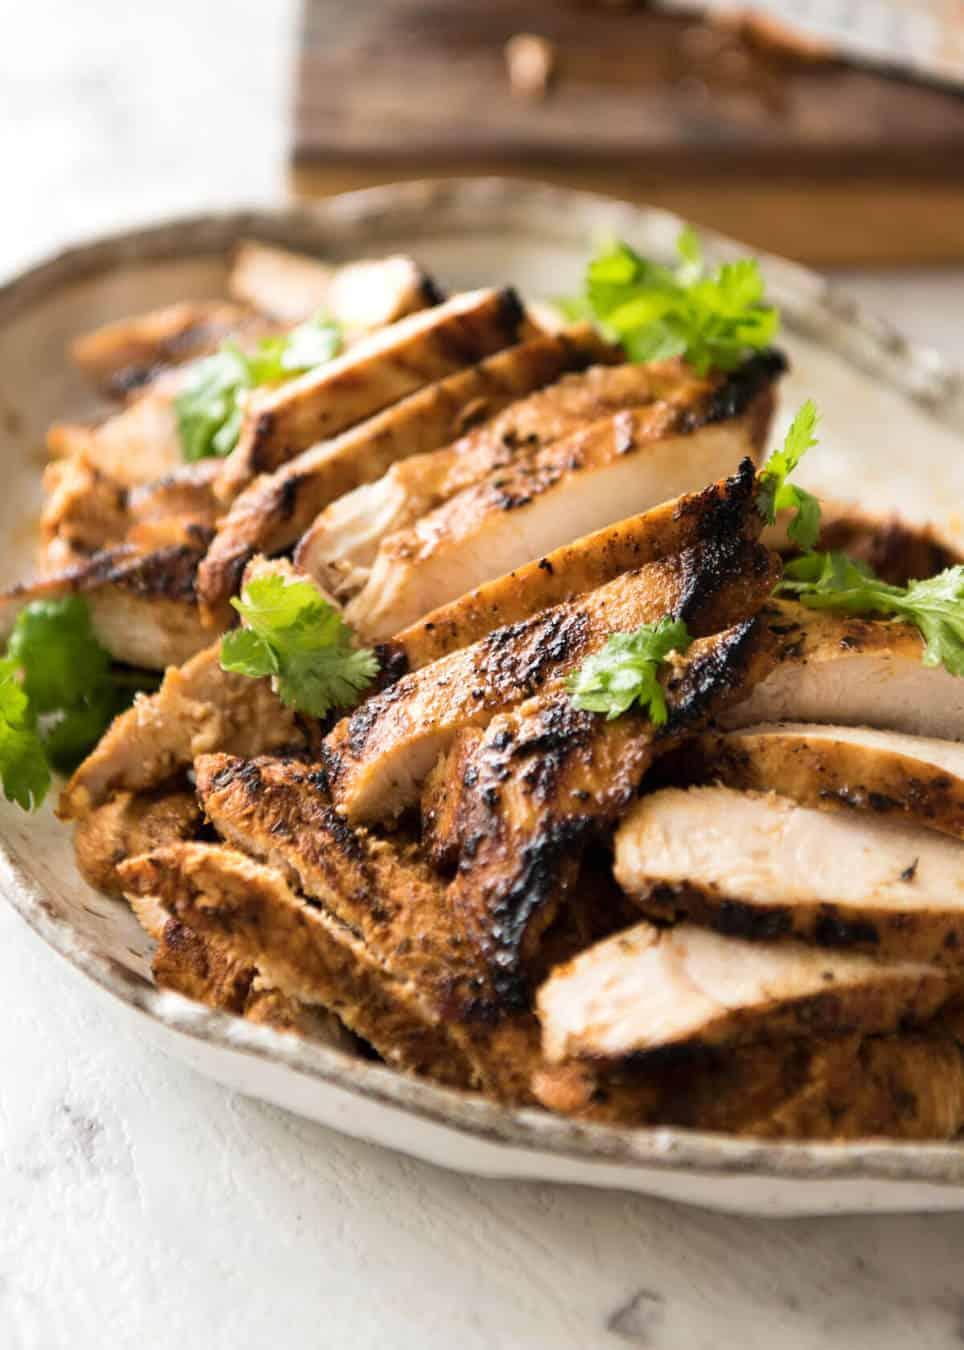 Juicy Chicken Fajitas beautifully seasoned with a homemade Fajita Seasoning. www.recipetineats.com